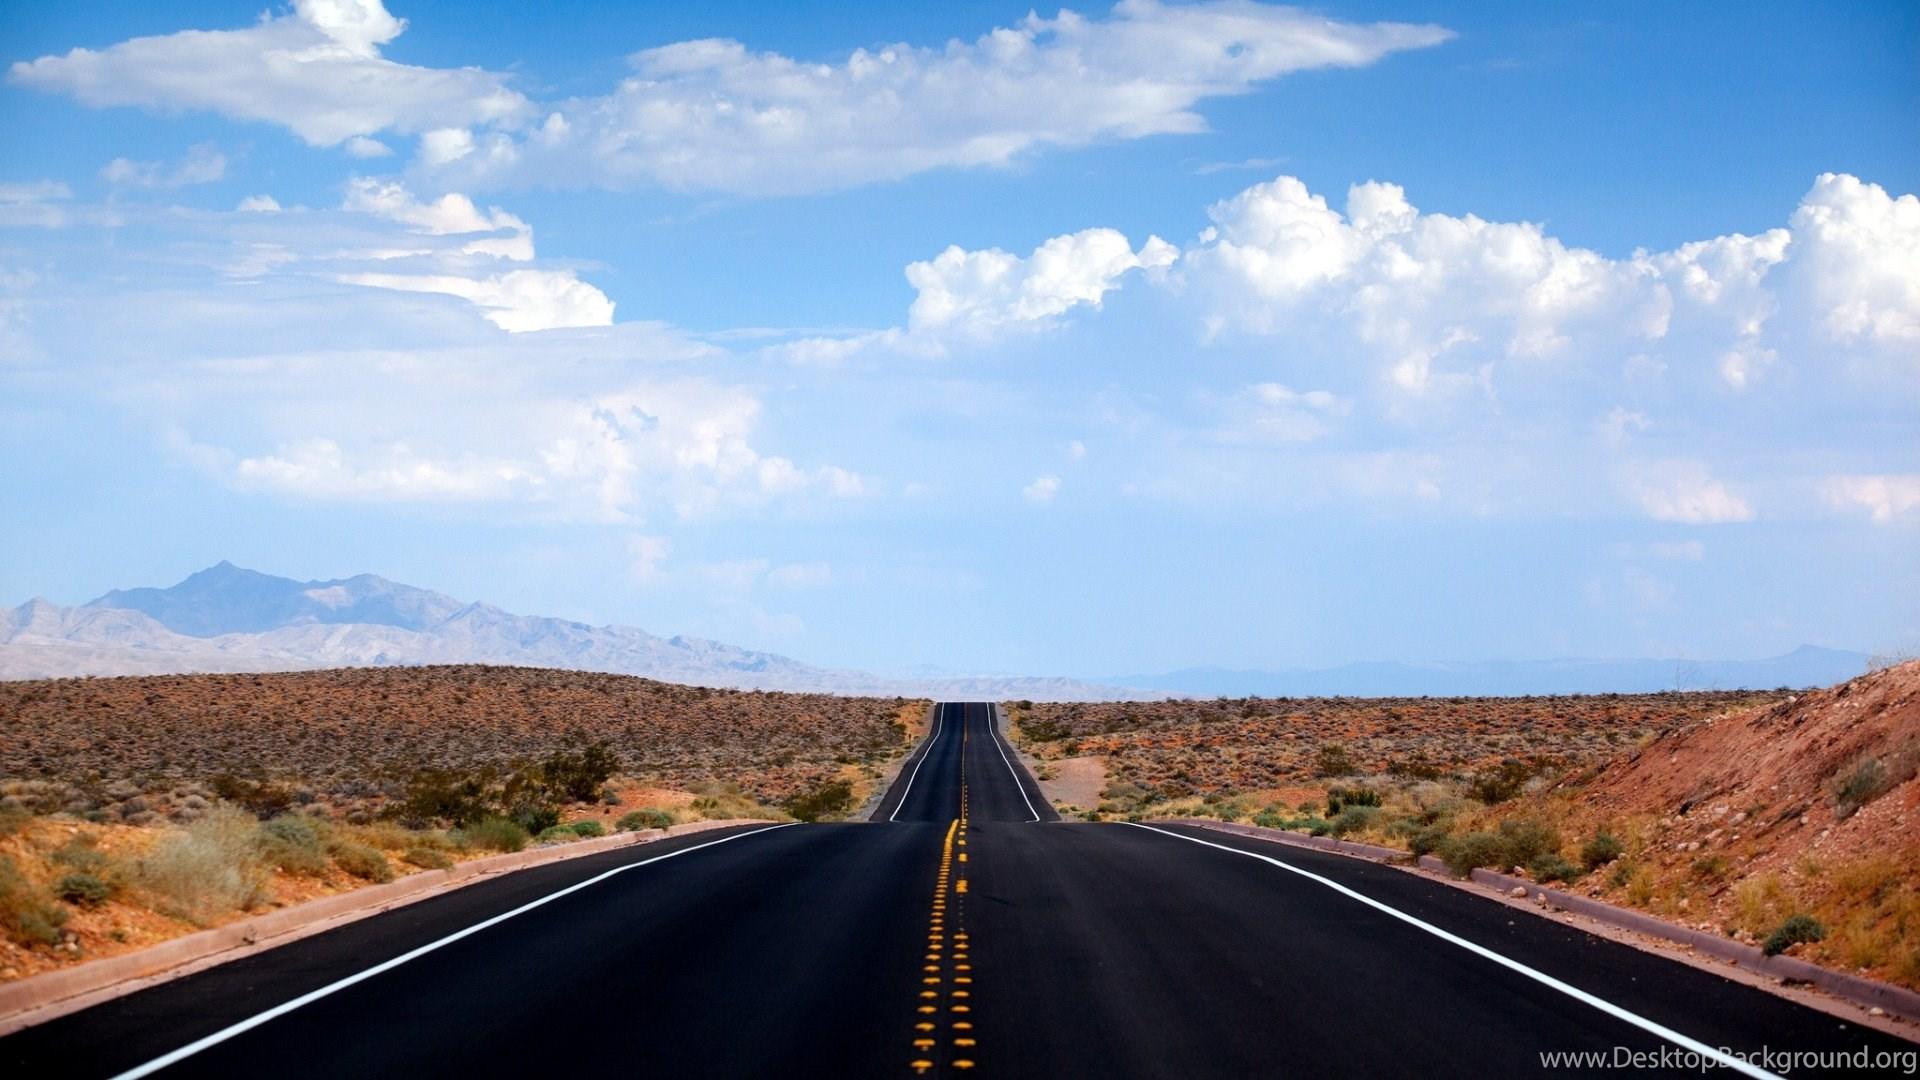 1920x1080 desert road nevada wallpapers desktop background - Nevada wallpaper hd ...